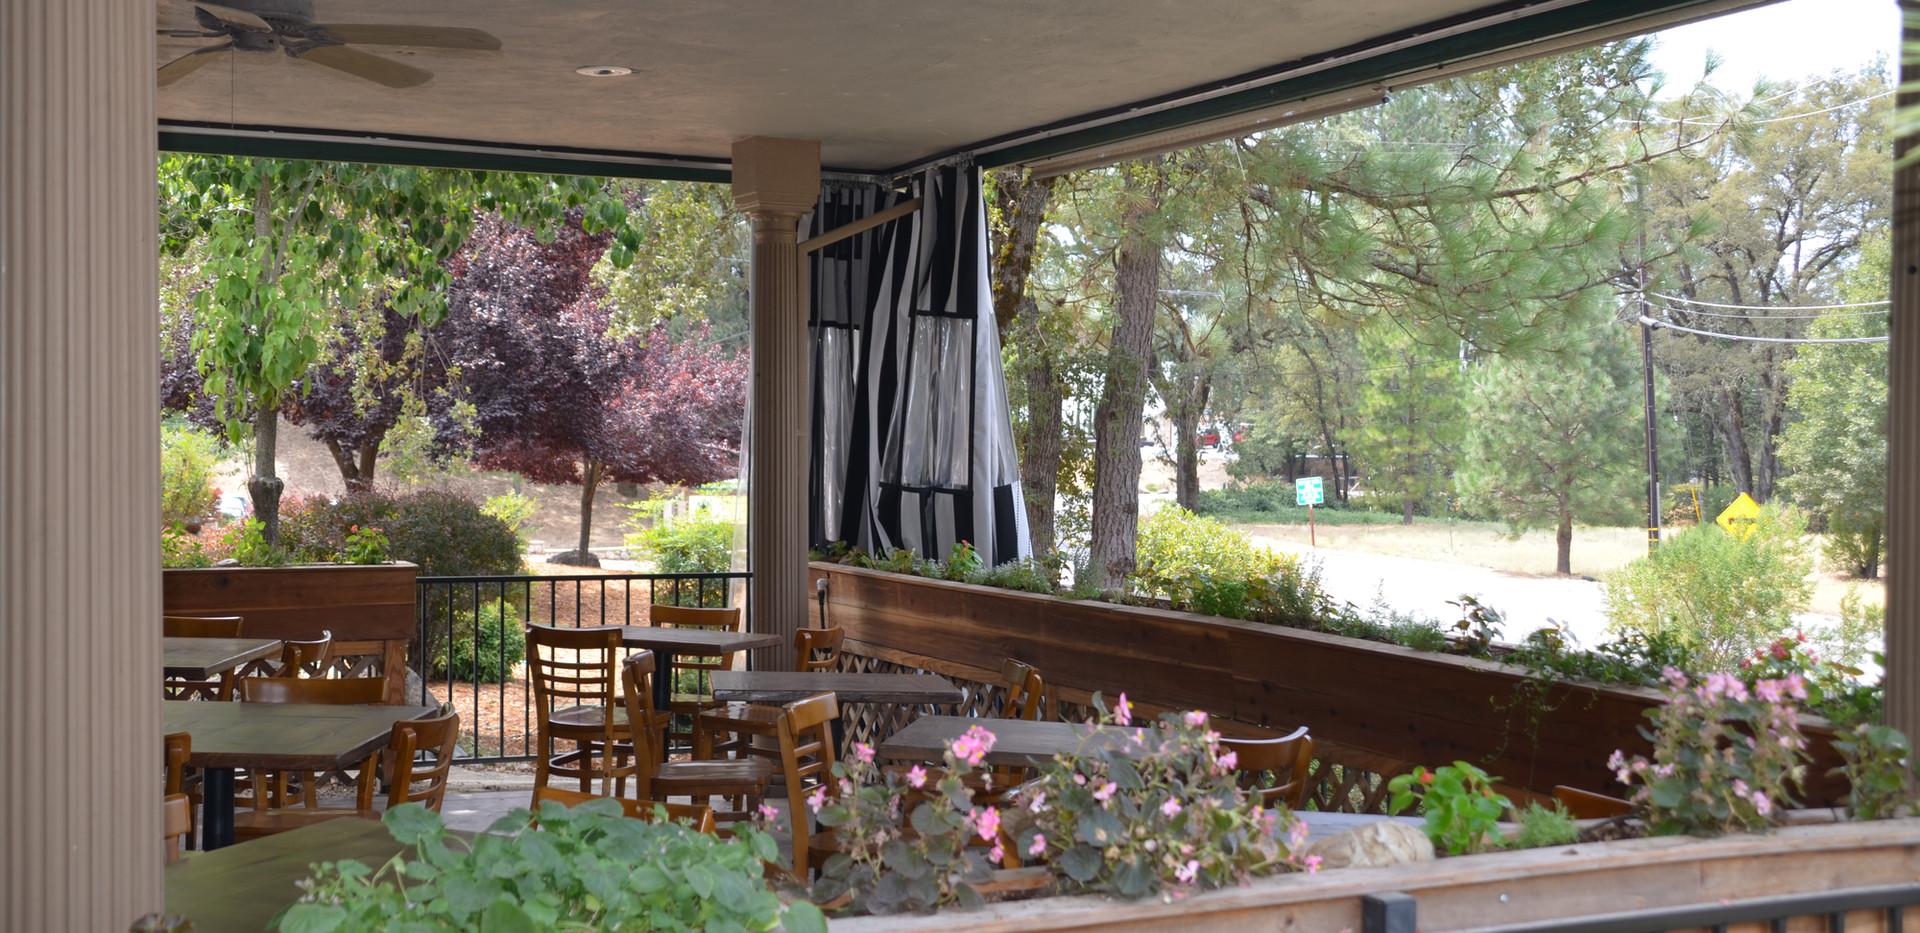 The Tin Lantern Bar & Grill. Outdoor Padio. Meadow Vista, CA.